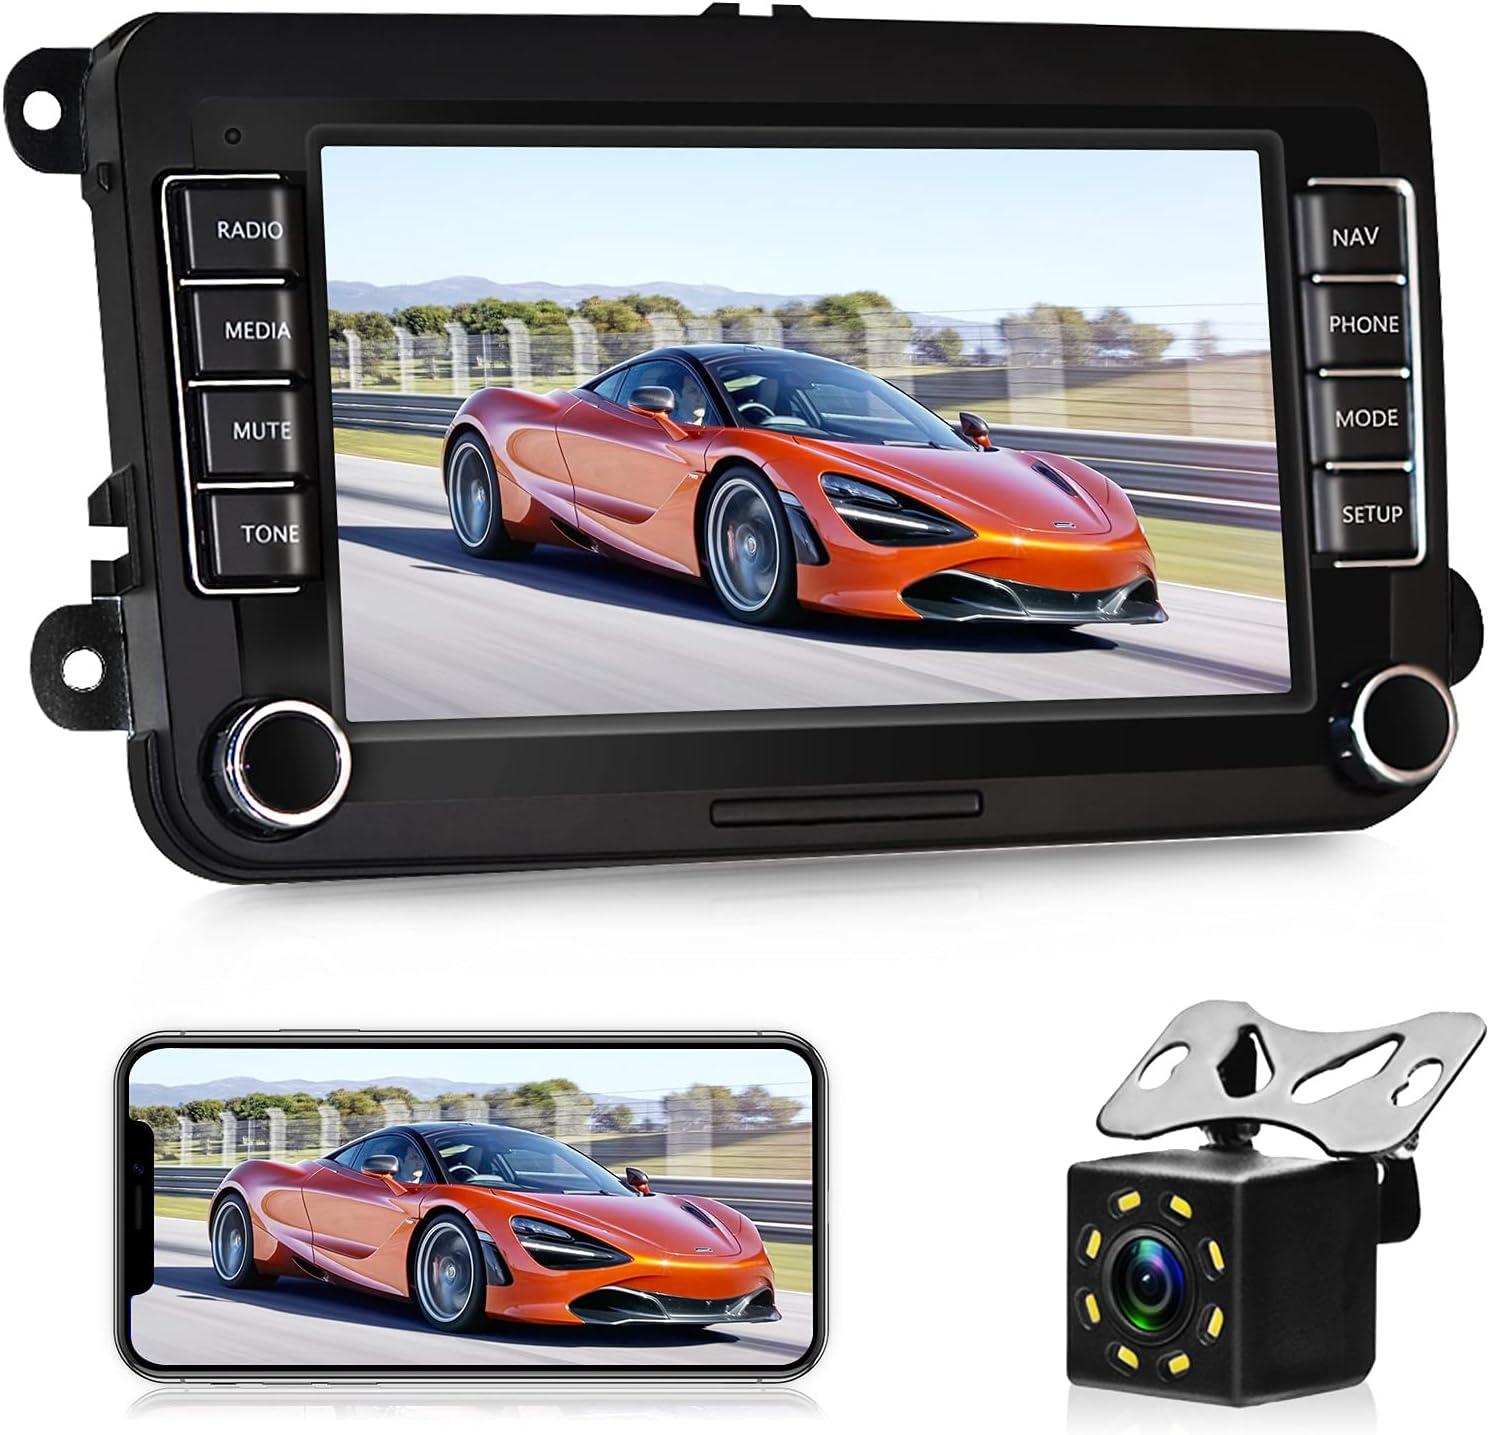 Radio de Coche 2 DIN Android 10.0 con Carplay para VW Golf V Vi Passat B6 Polo Skoda 7 Pulgadas HD Pantalla Táctil GPS Estéreo con WiFi Bluetooth RDS Dab SWC Enlace Espejo + Cámara Trasera